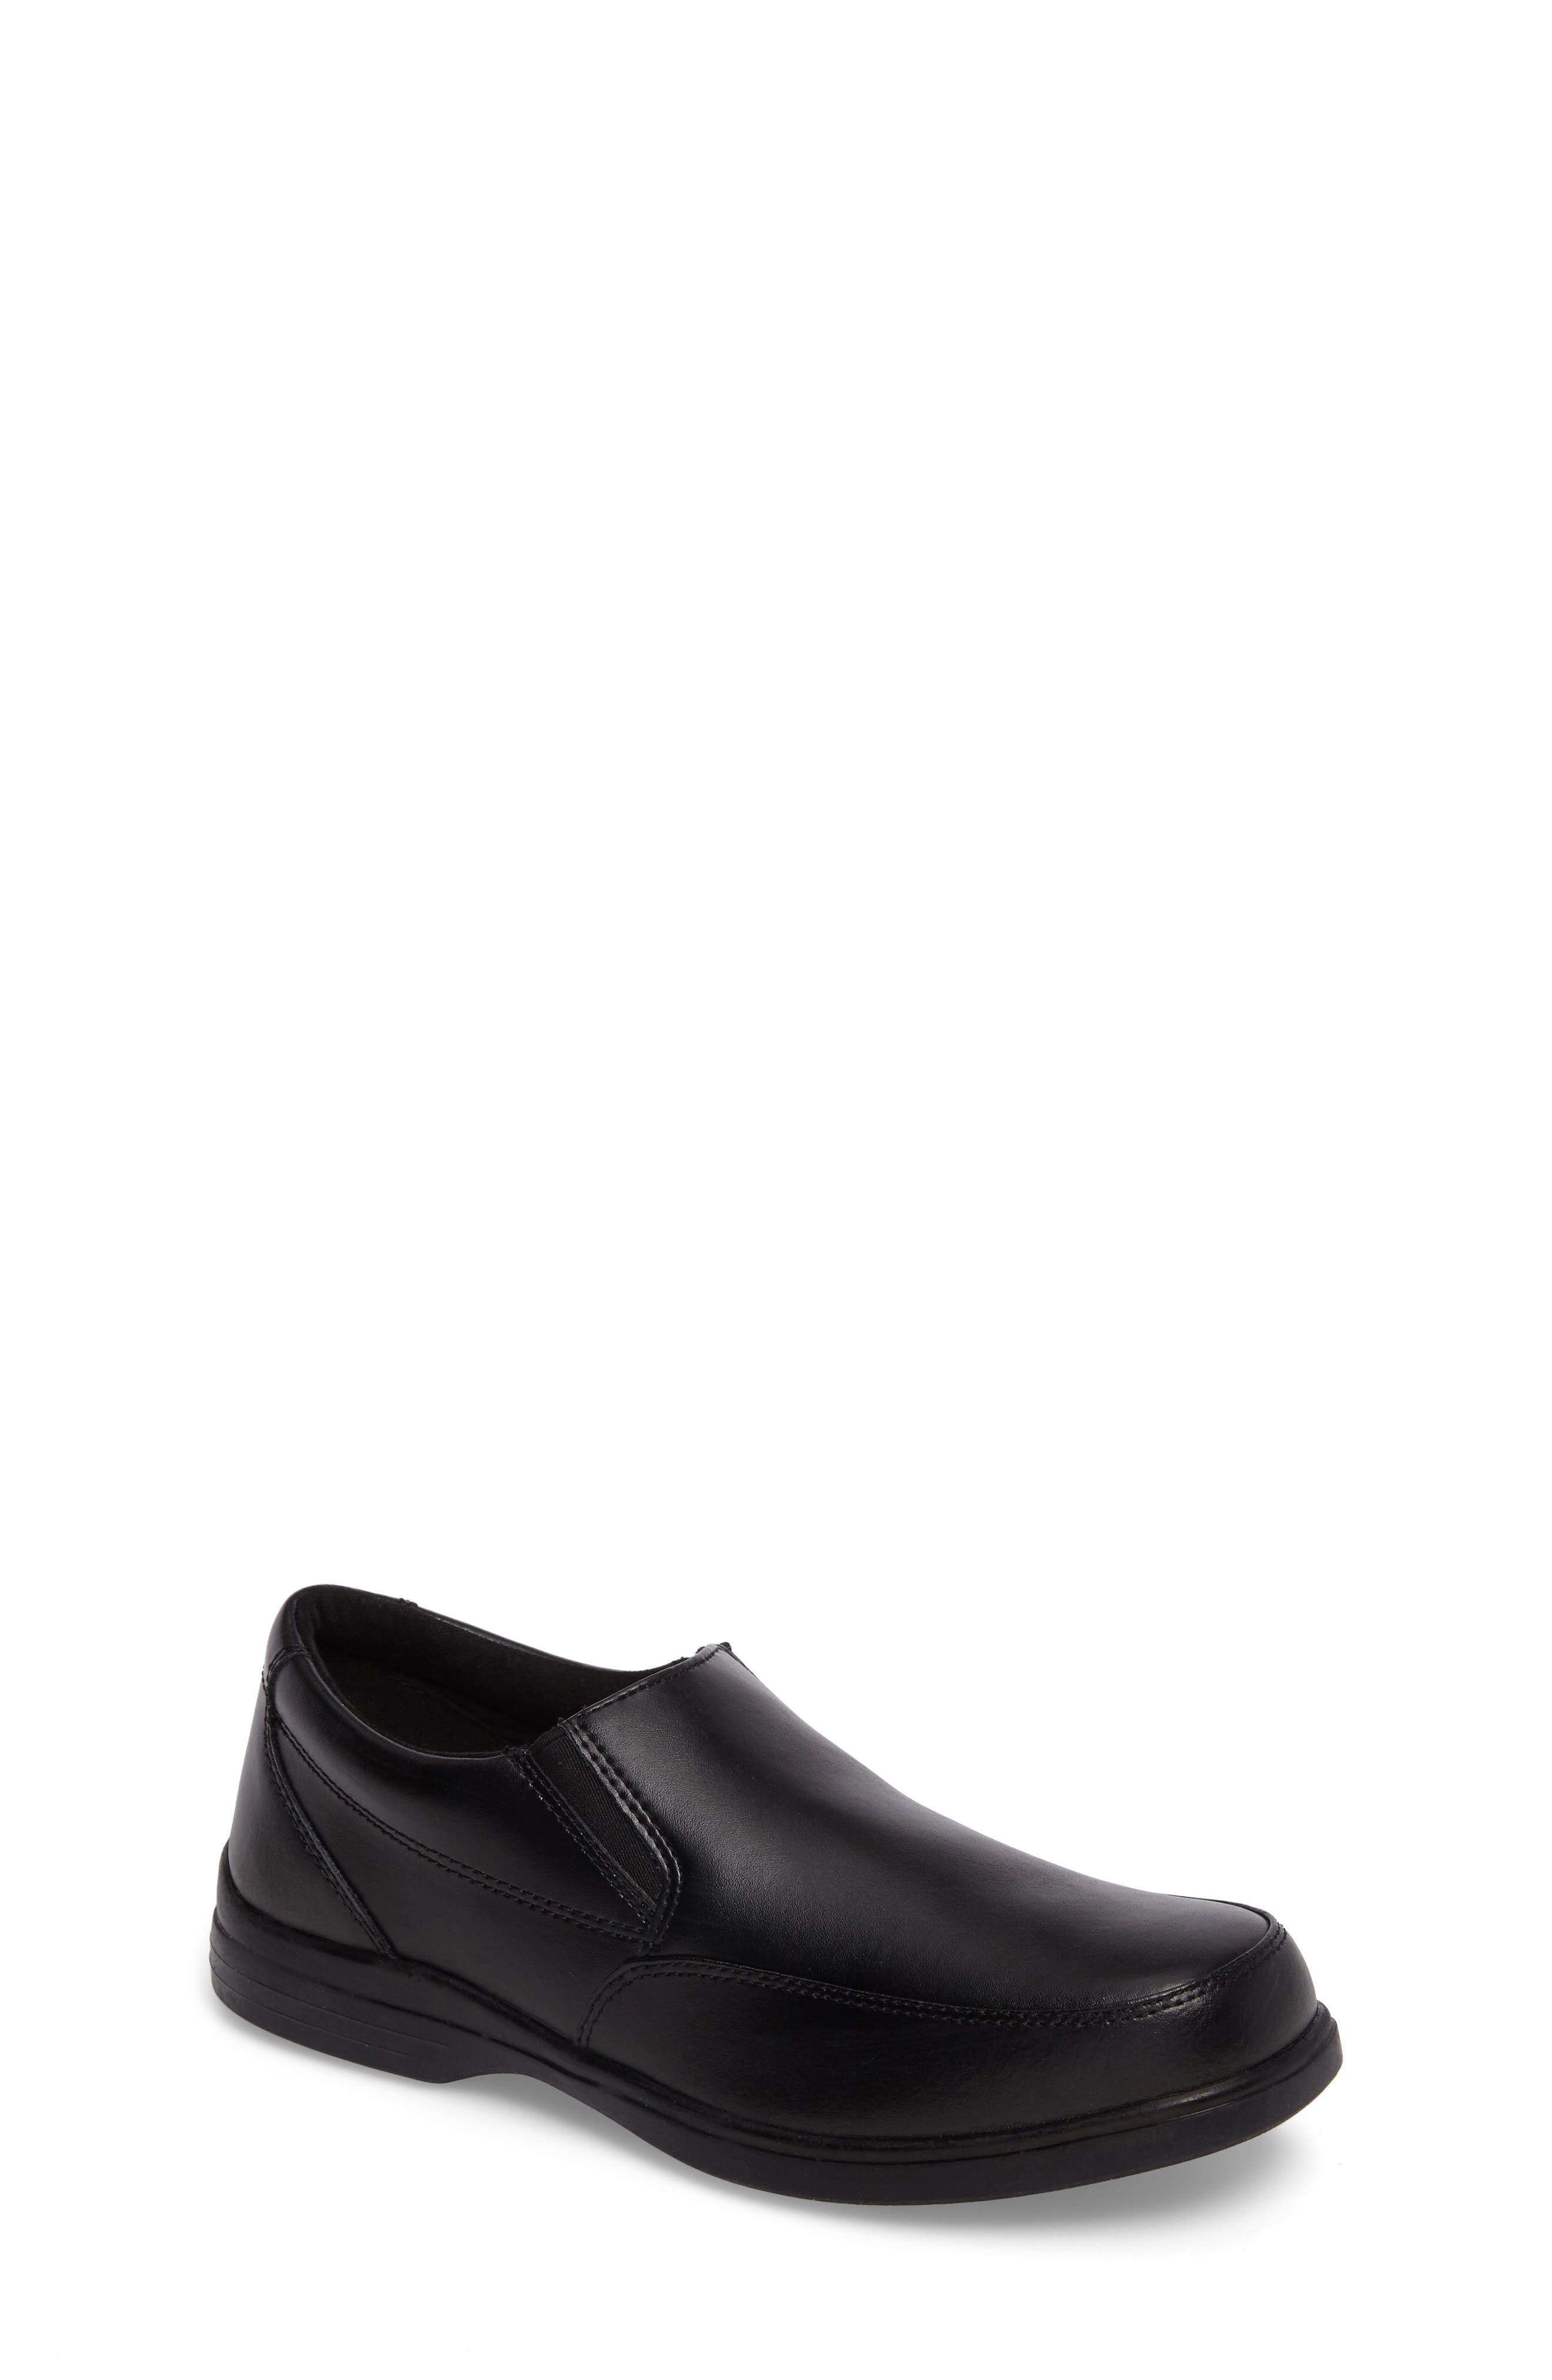 Shane Slip-On Dress Shoe,                             Main thumbnail 1, color,                             001